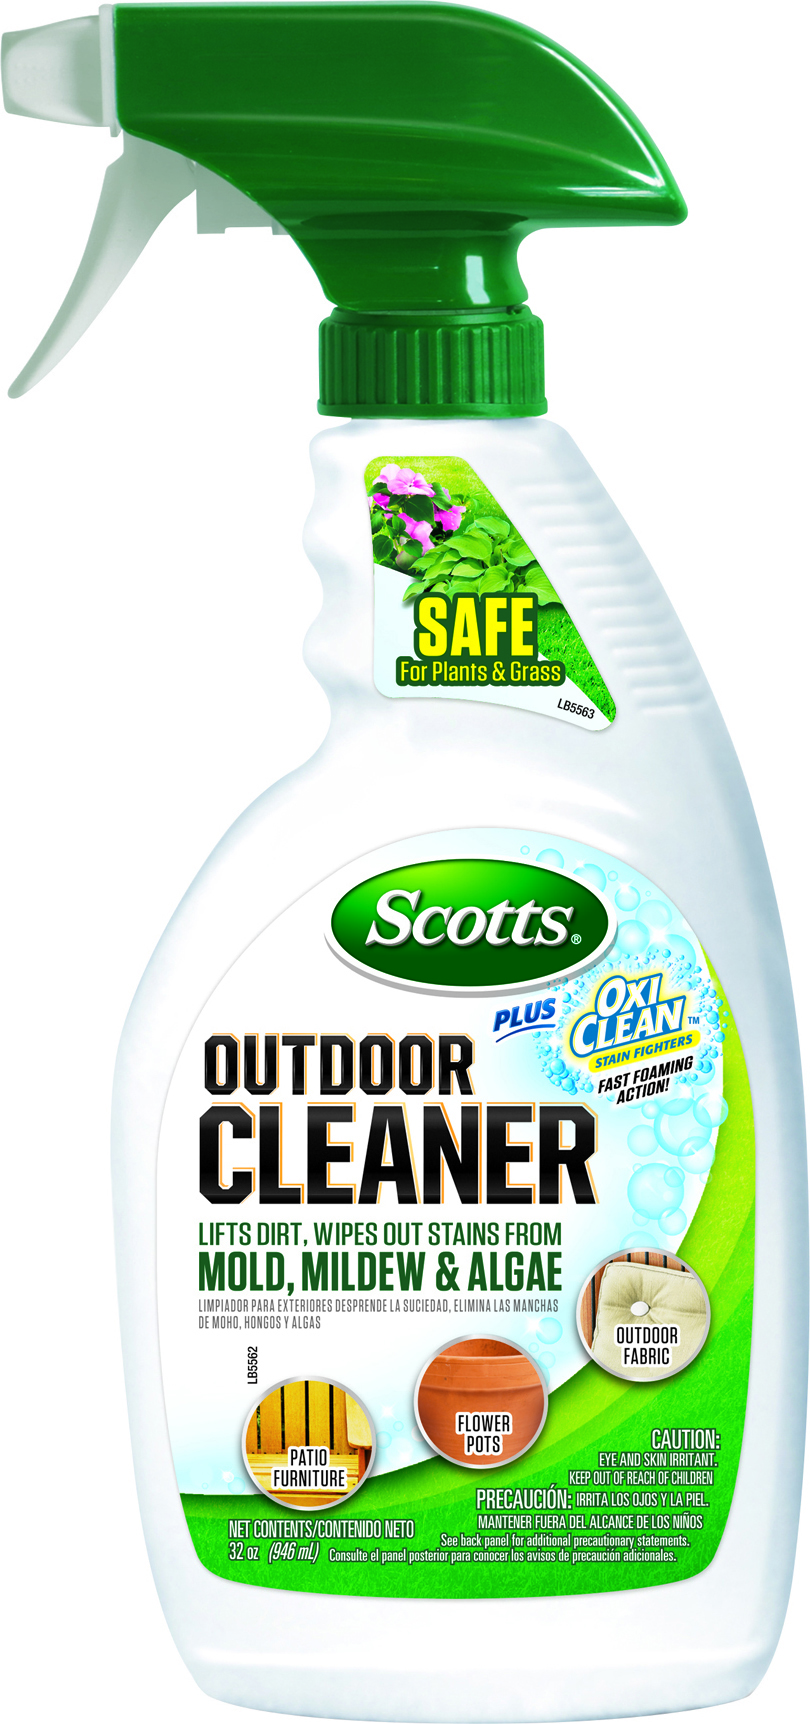 Scotts Outdoor Cleaner Plus Oxi Cleaner RTU